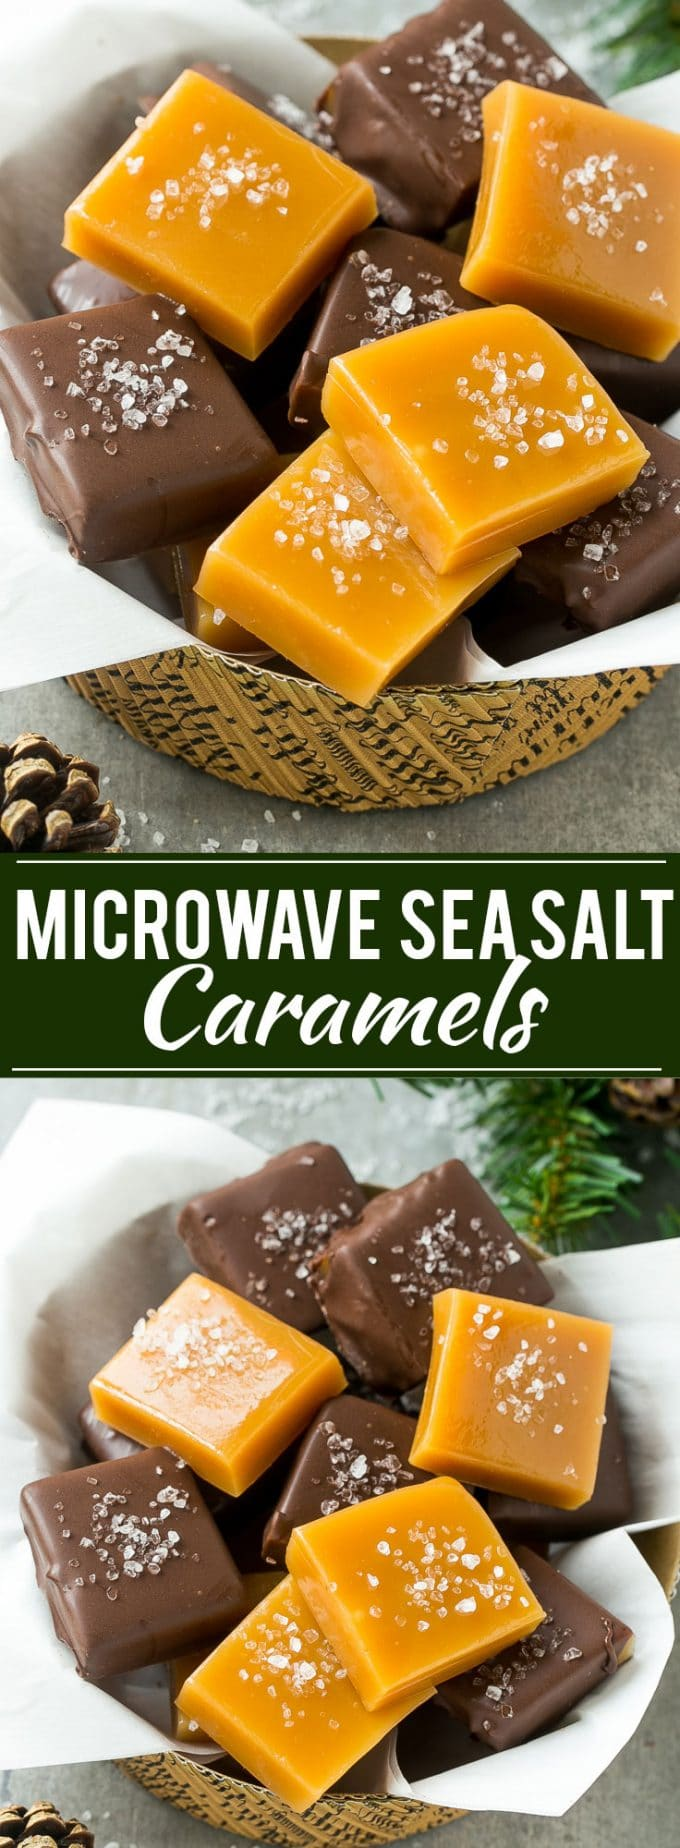 Microwave Caramel Recipe   Homemade Caramels   Sea Salt Caramel   Easy Caramel Recipe   Caramel Recipe